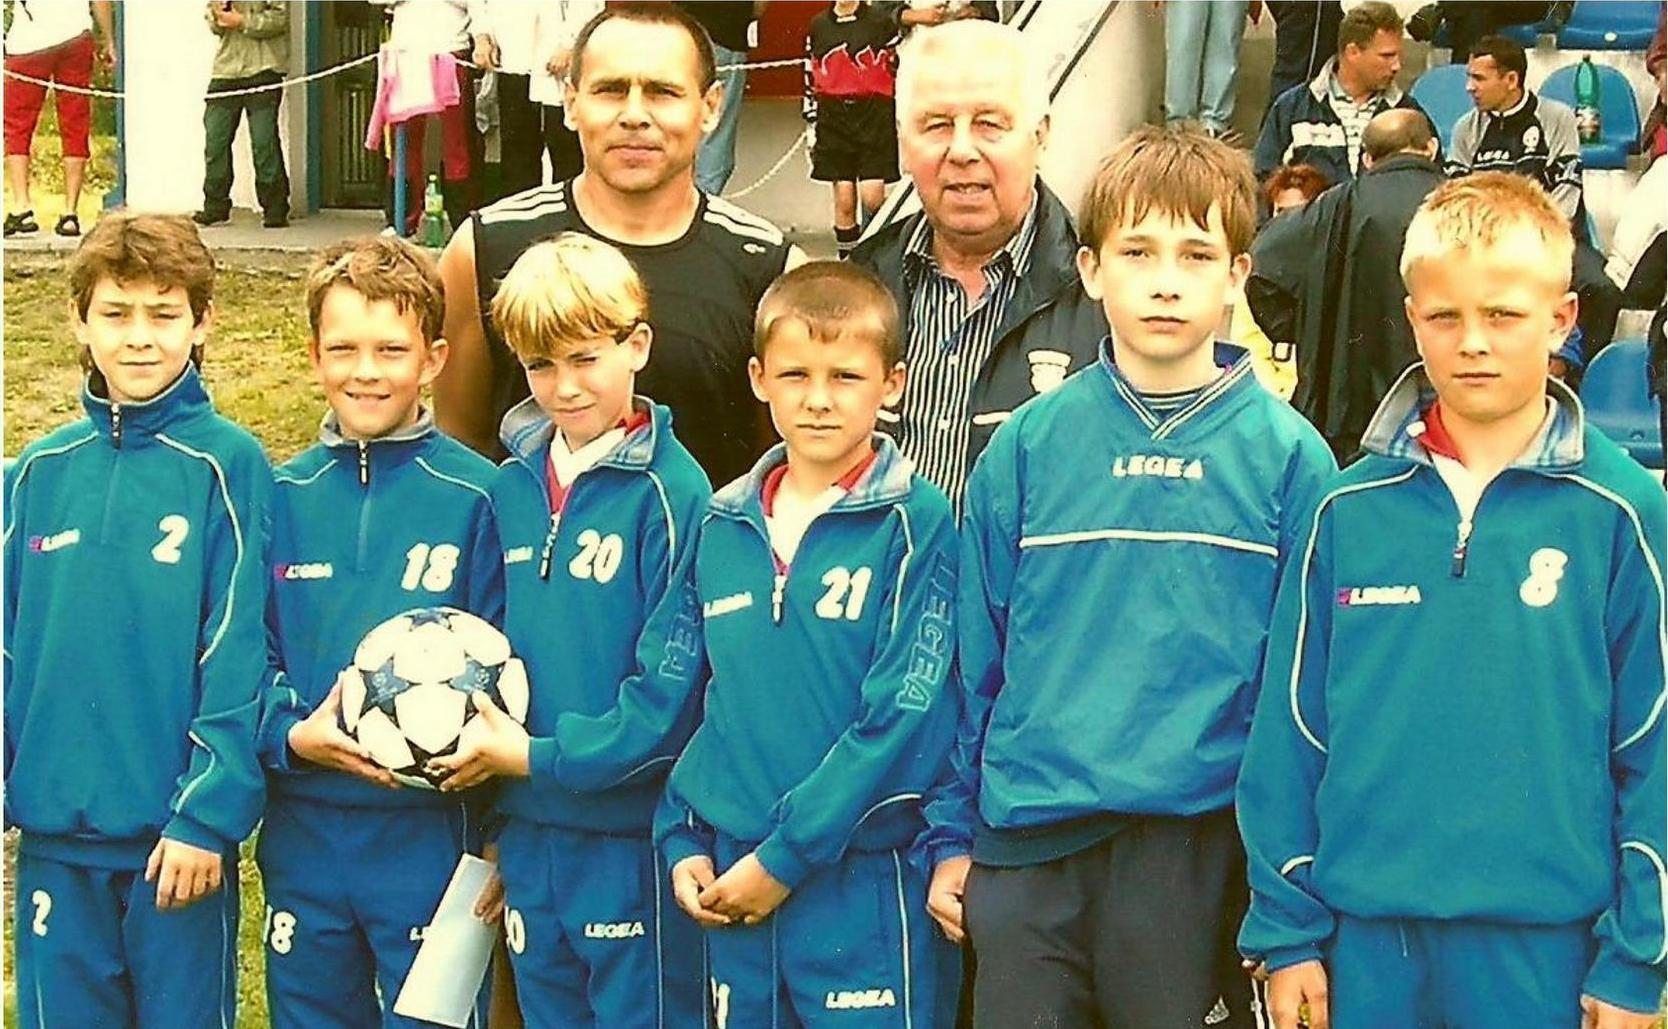 File A21 Josef Masopust a Jan Skorkovsk½ žáci turnaj Č Kamenice r